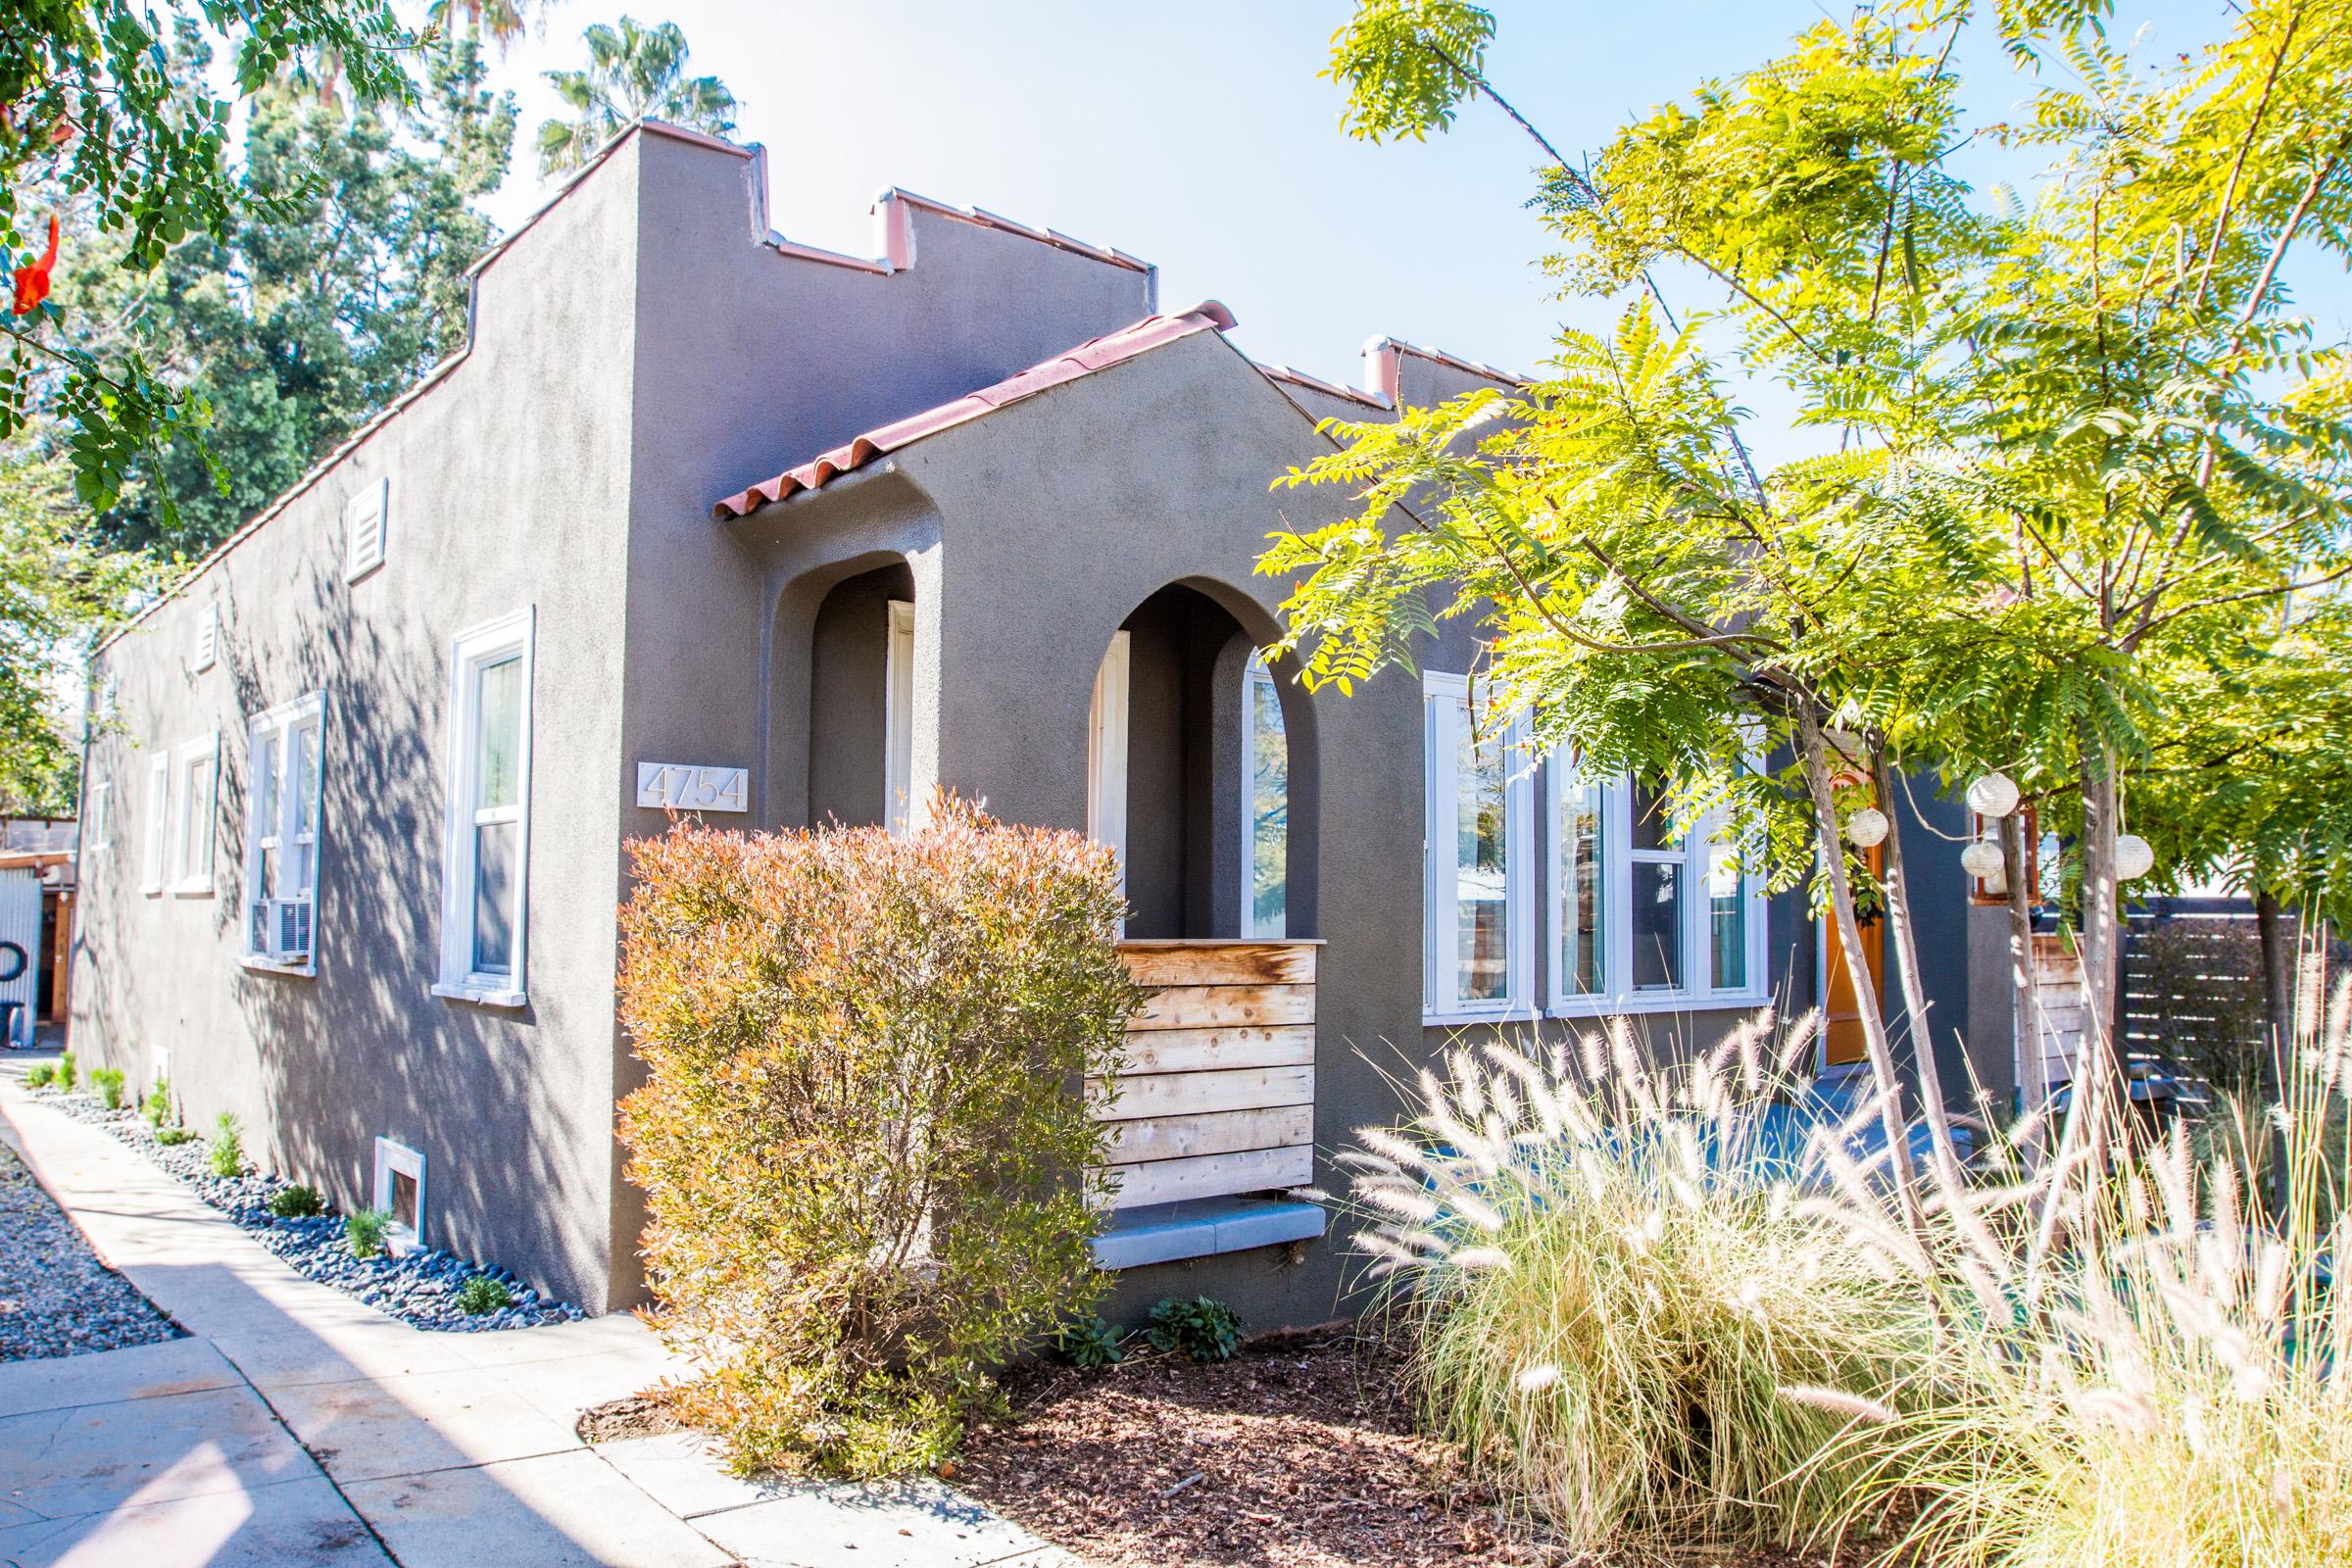 http://www.trulia.com/property/1094832382-4752-York-Blvd-Los-Angeles-CA-90042